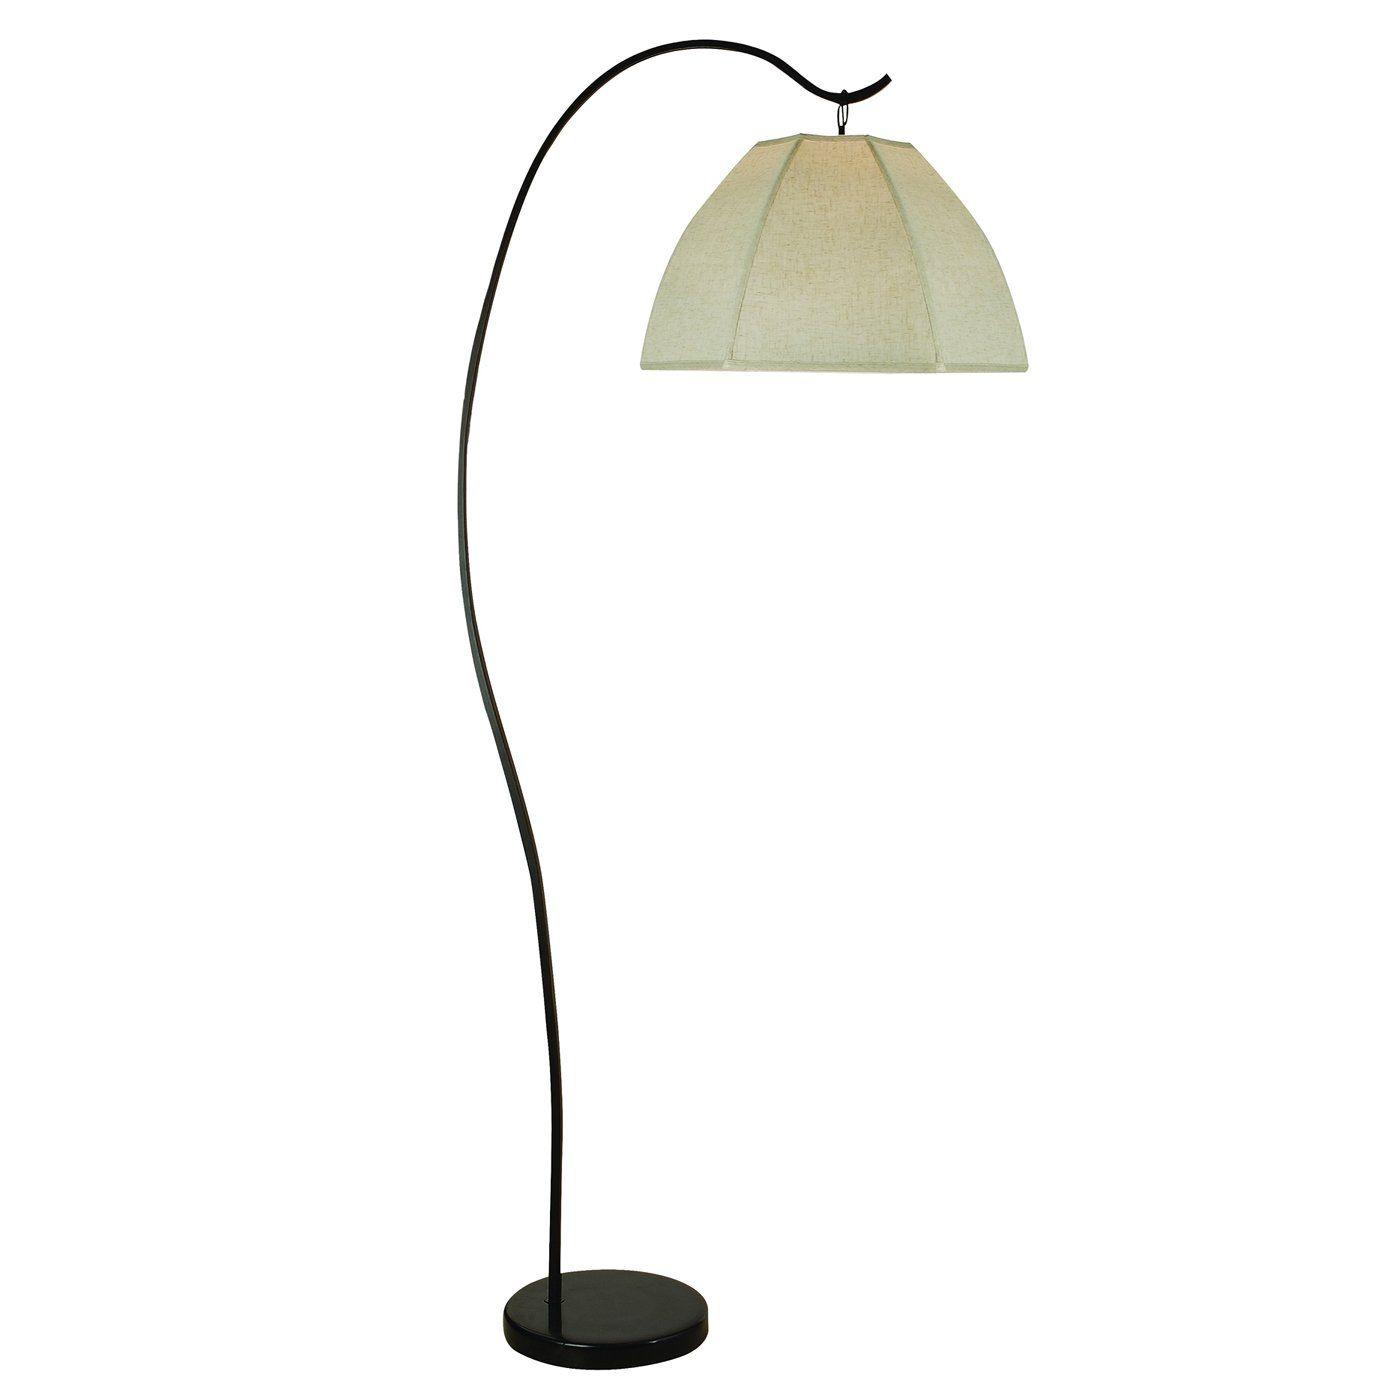 Trend Lighting TFA8965 Bordeaux Arc Floor Lamp Antique Bronze For Living Room